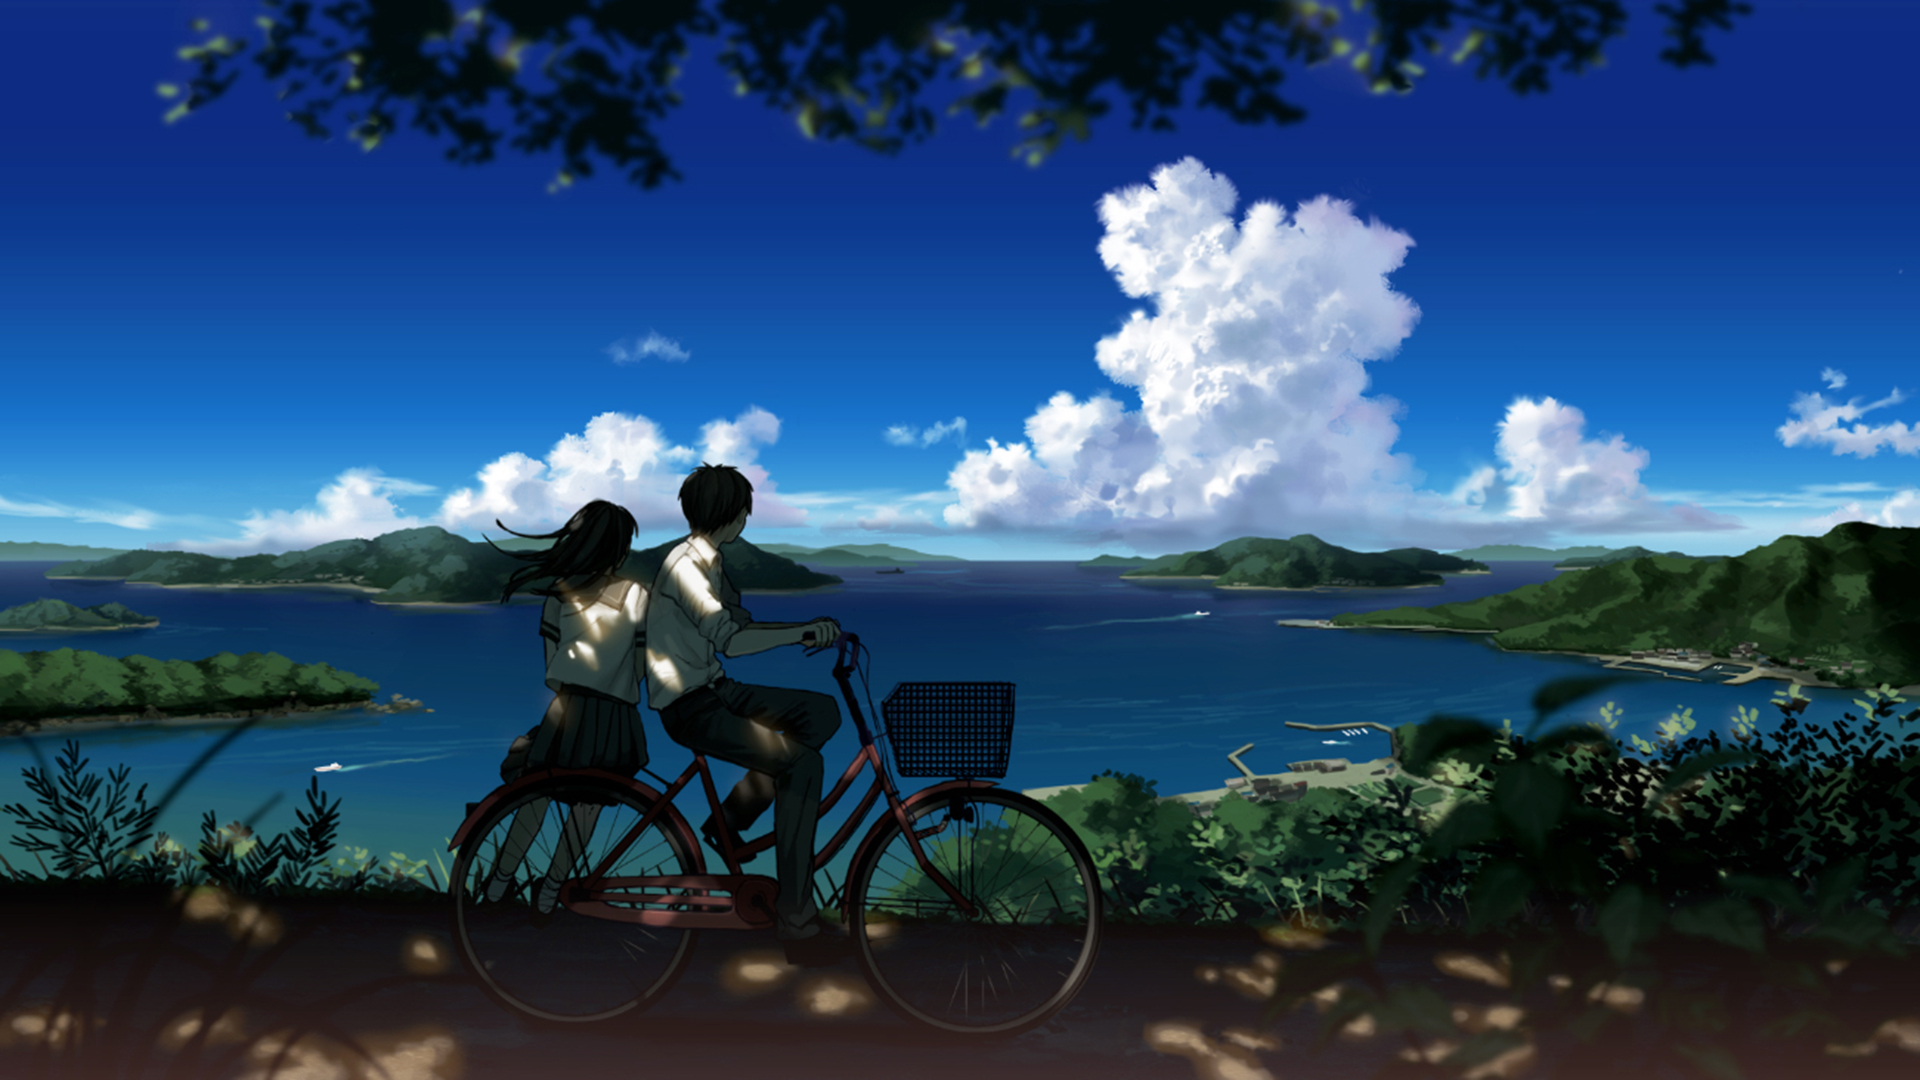 Bleach Wallpaper Quote Free Anime Landscape Backgrounds Pixelstalk Net